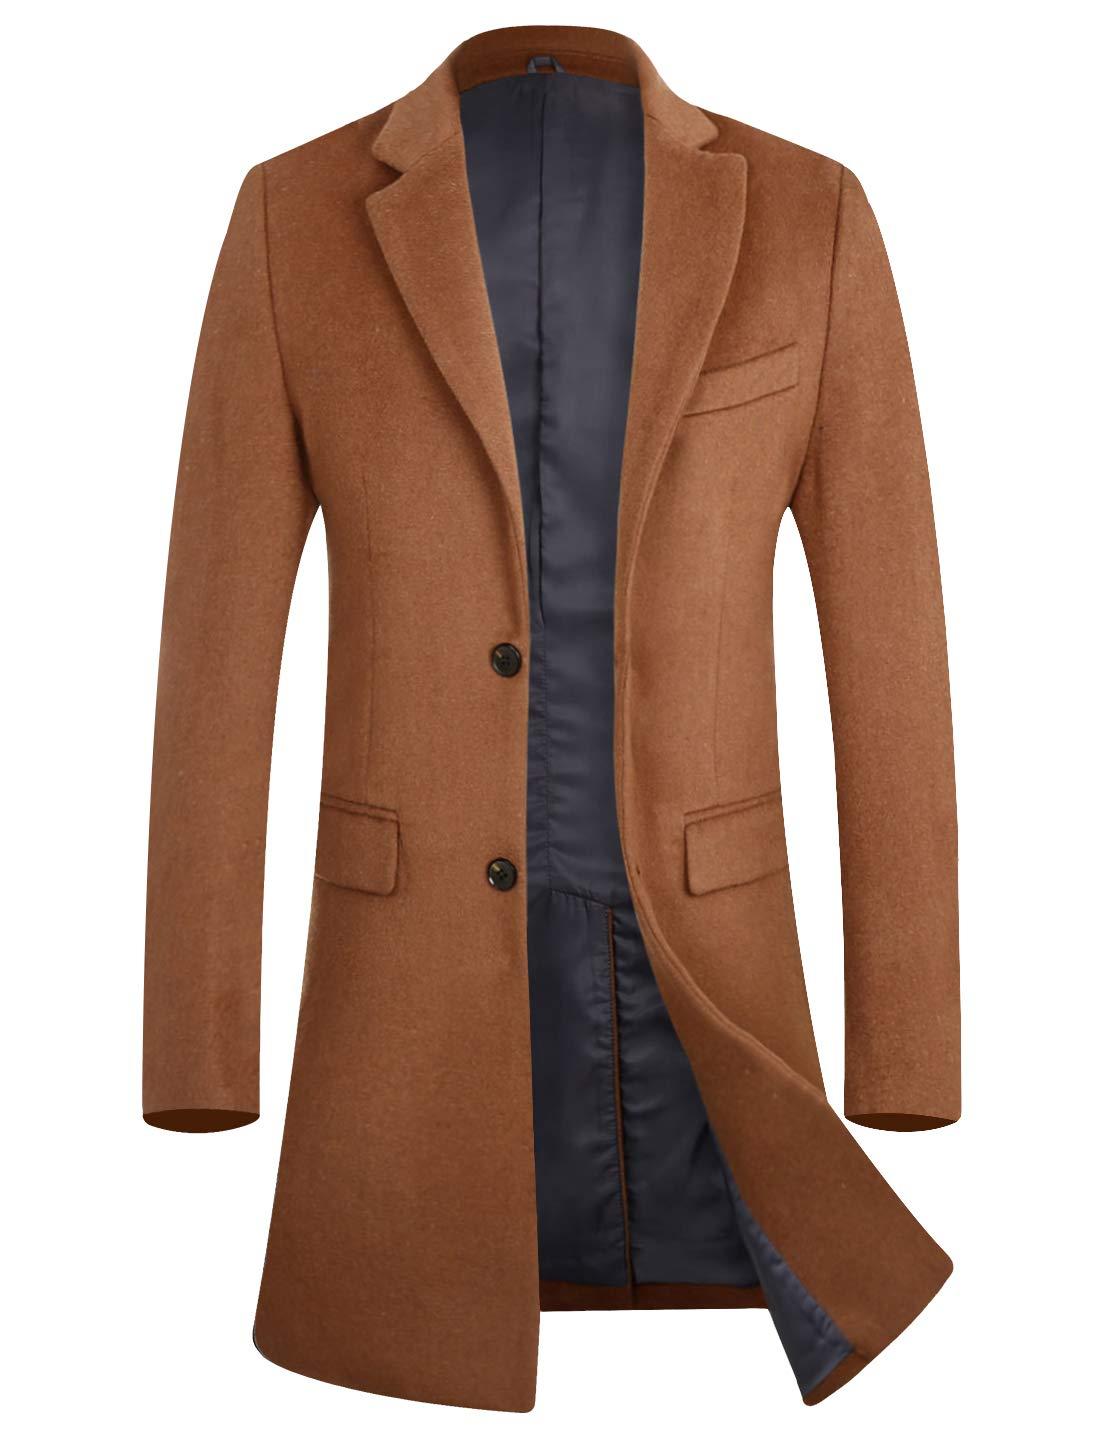 APTRO Men's Wool Blend Trench Coat Above Knee Winter Overcoat 1702 Camel M by APTRO